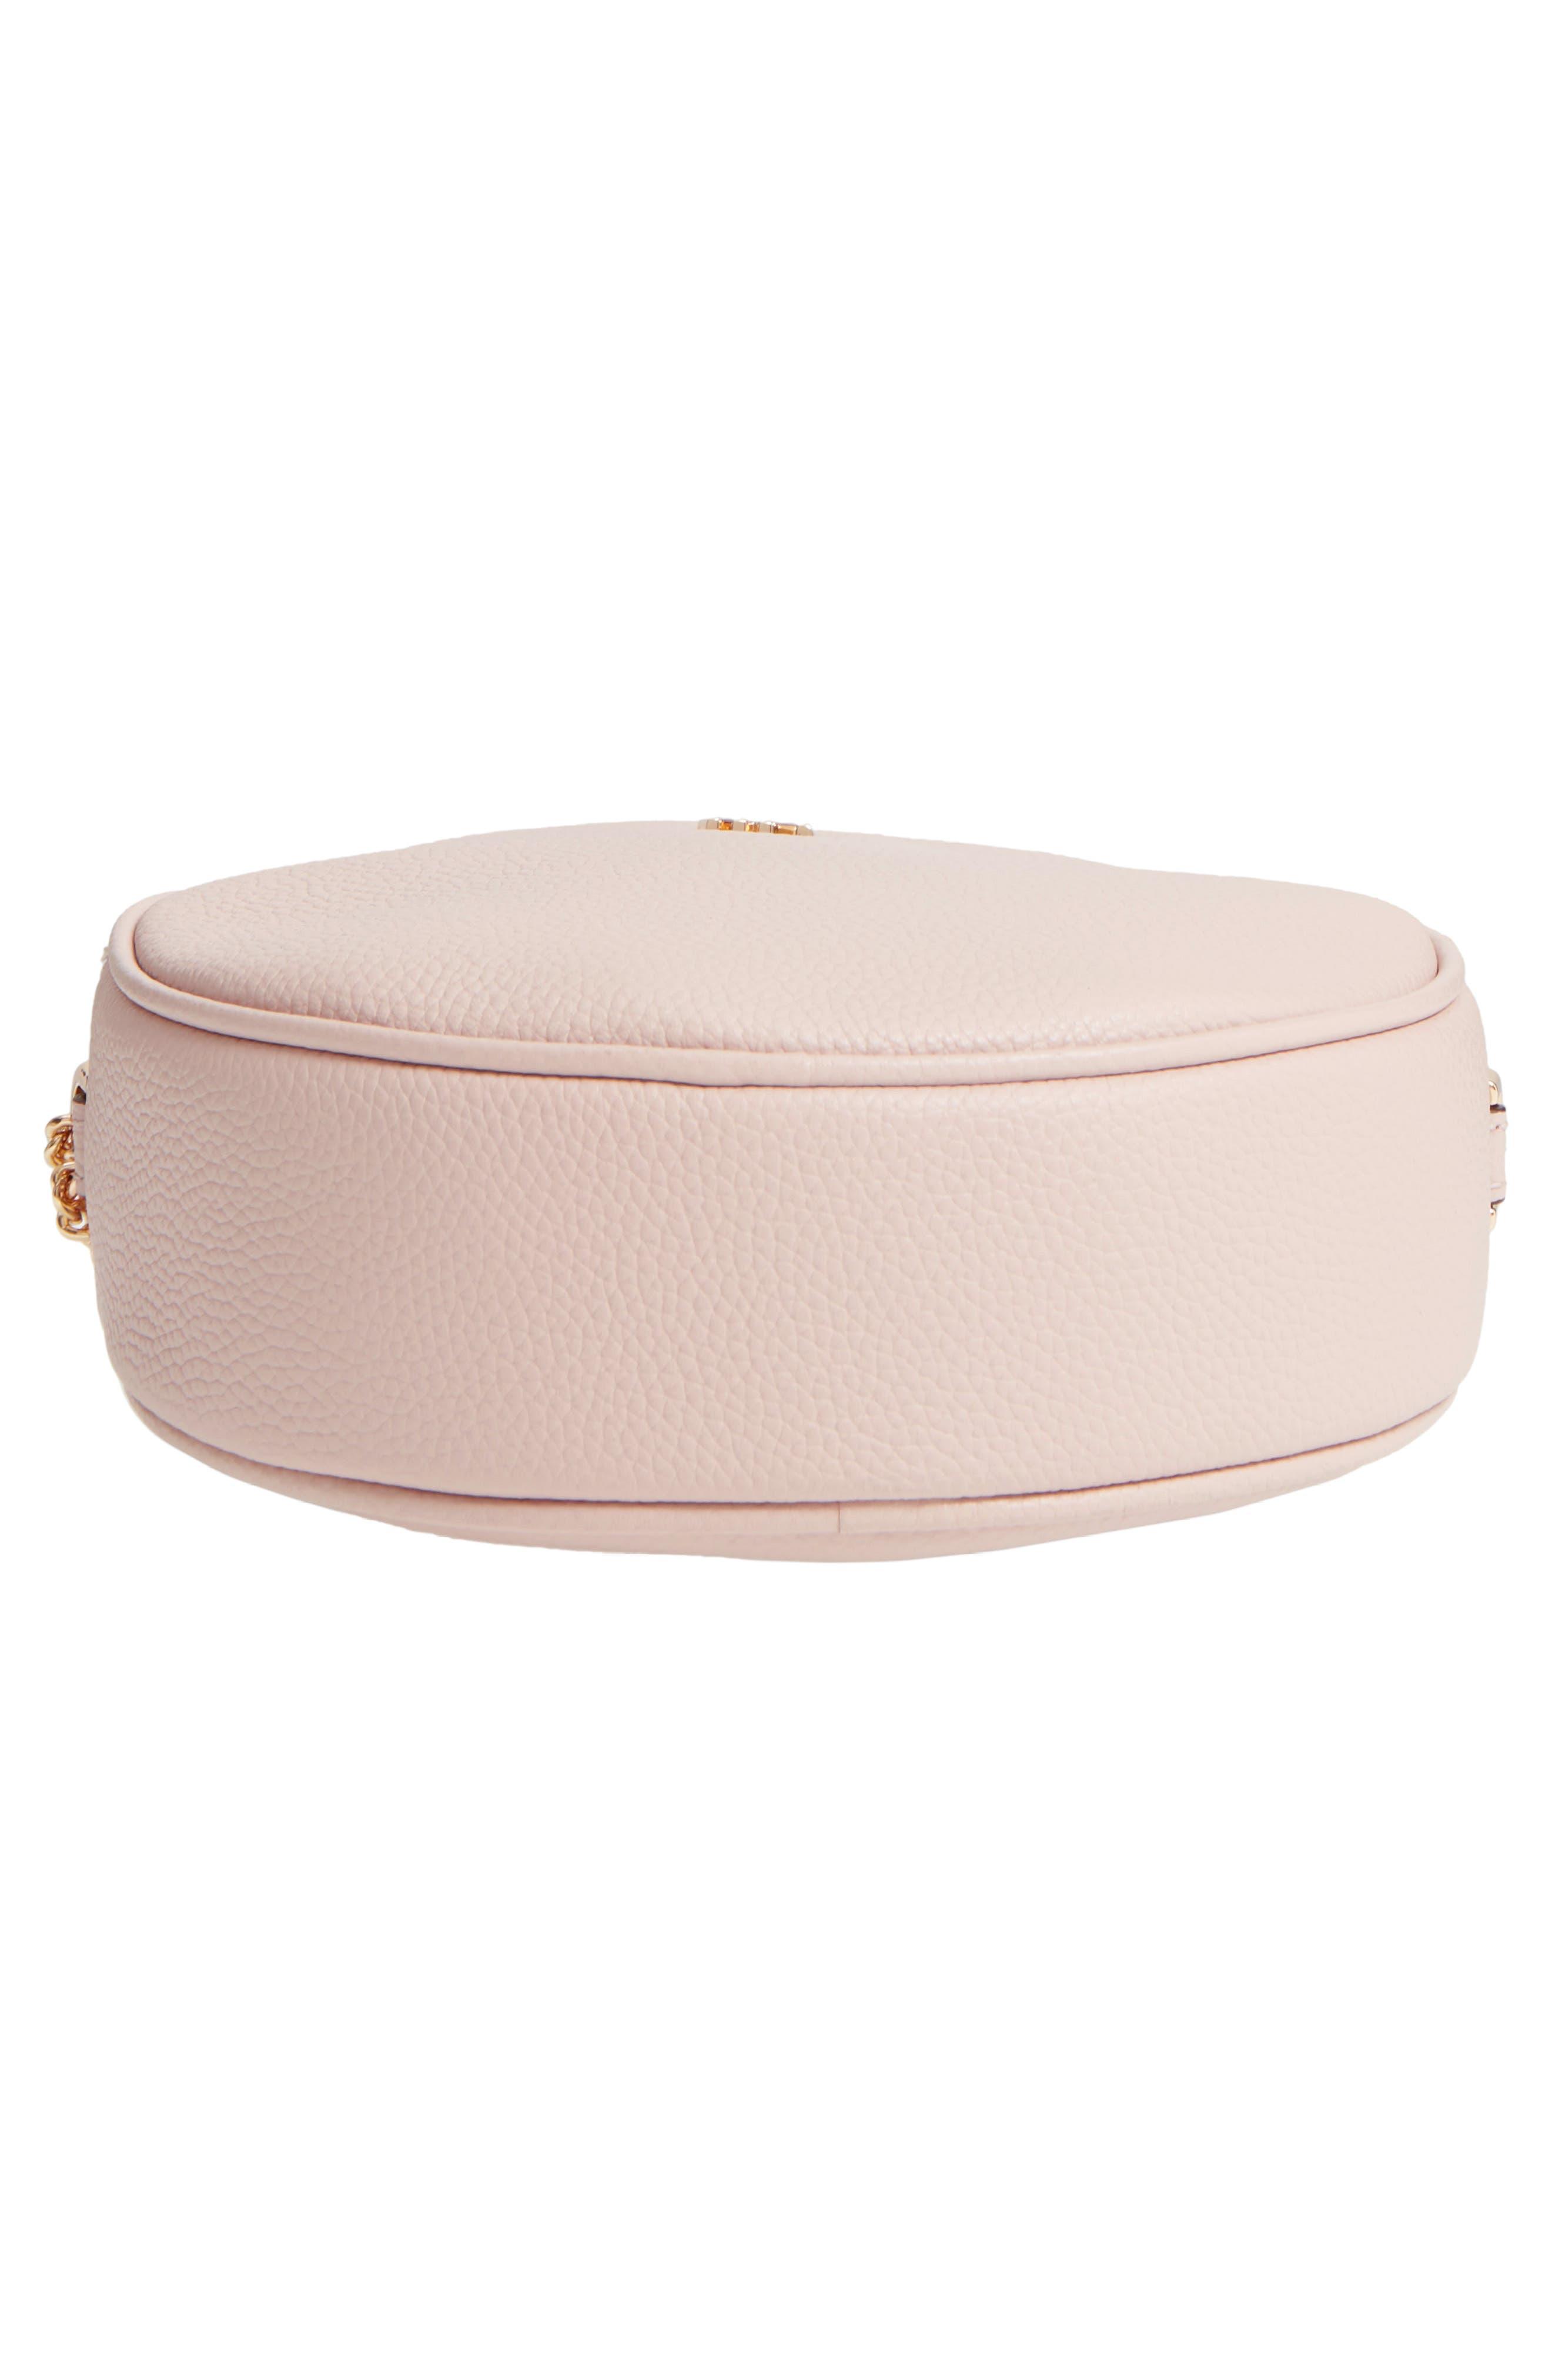 Medium Leather Canteen Bag,                             Alternate thumbnail 18, color,